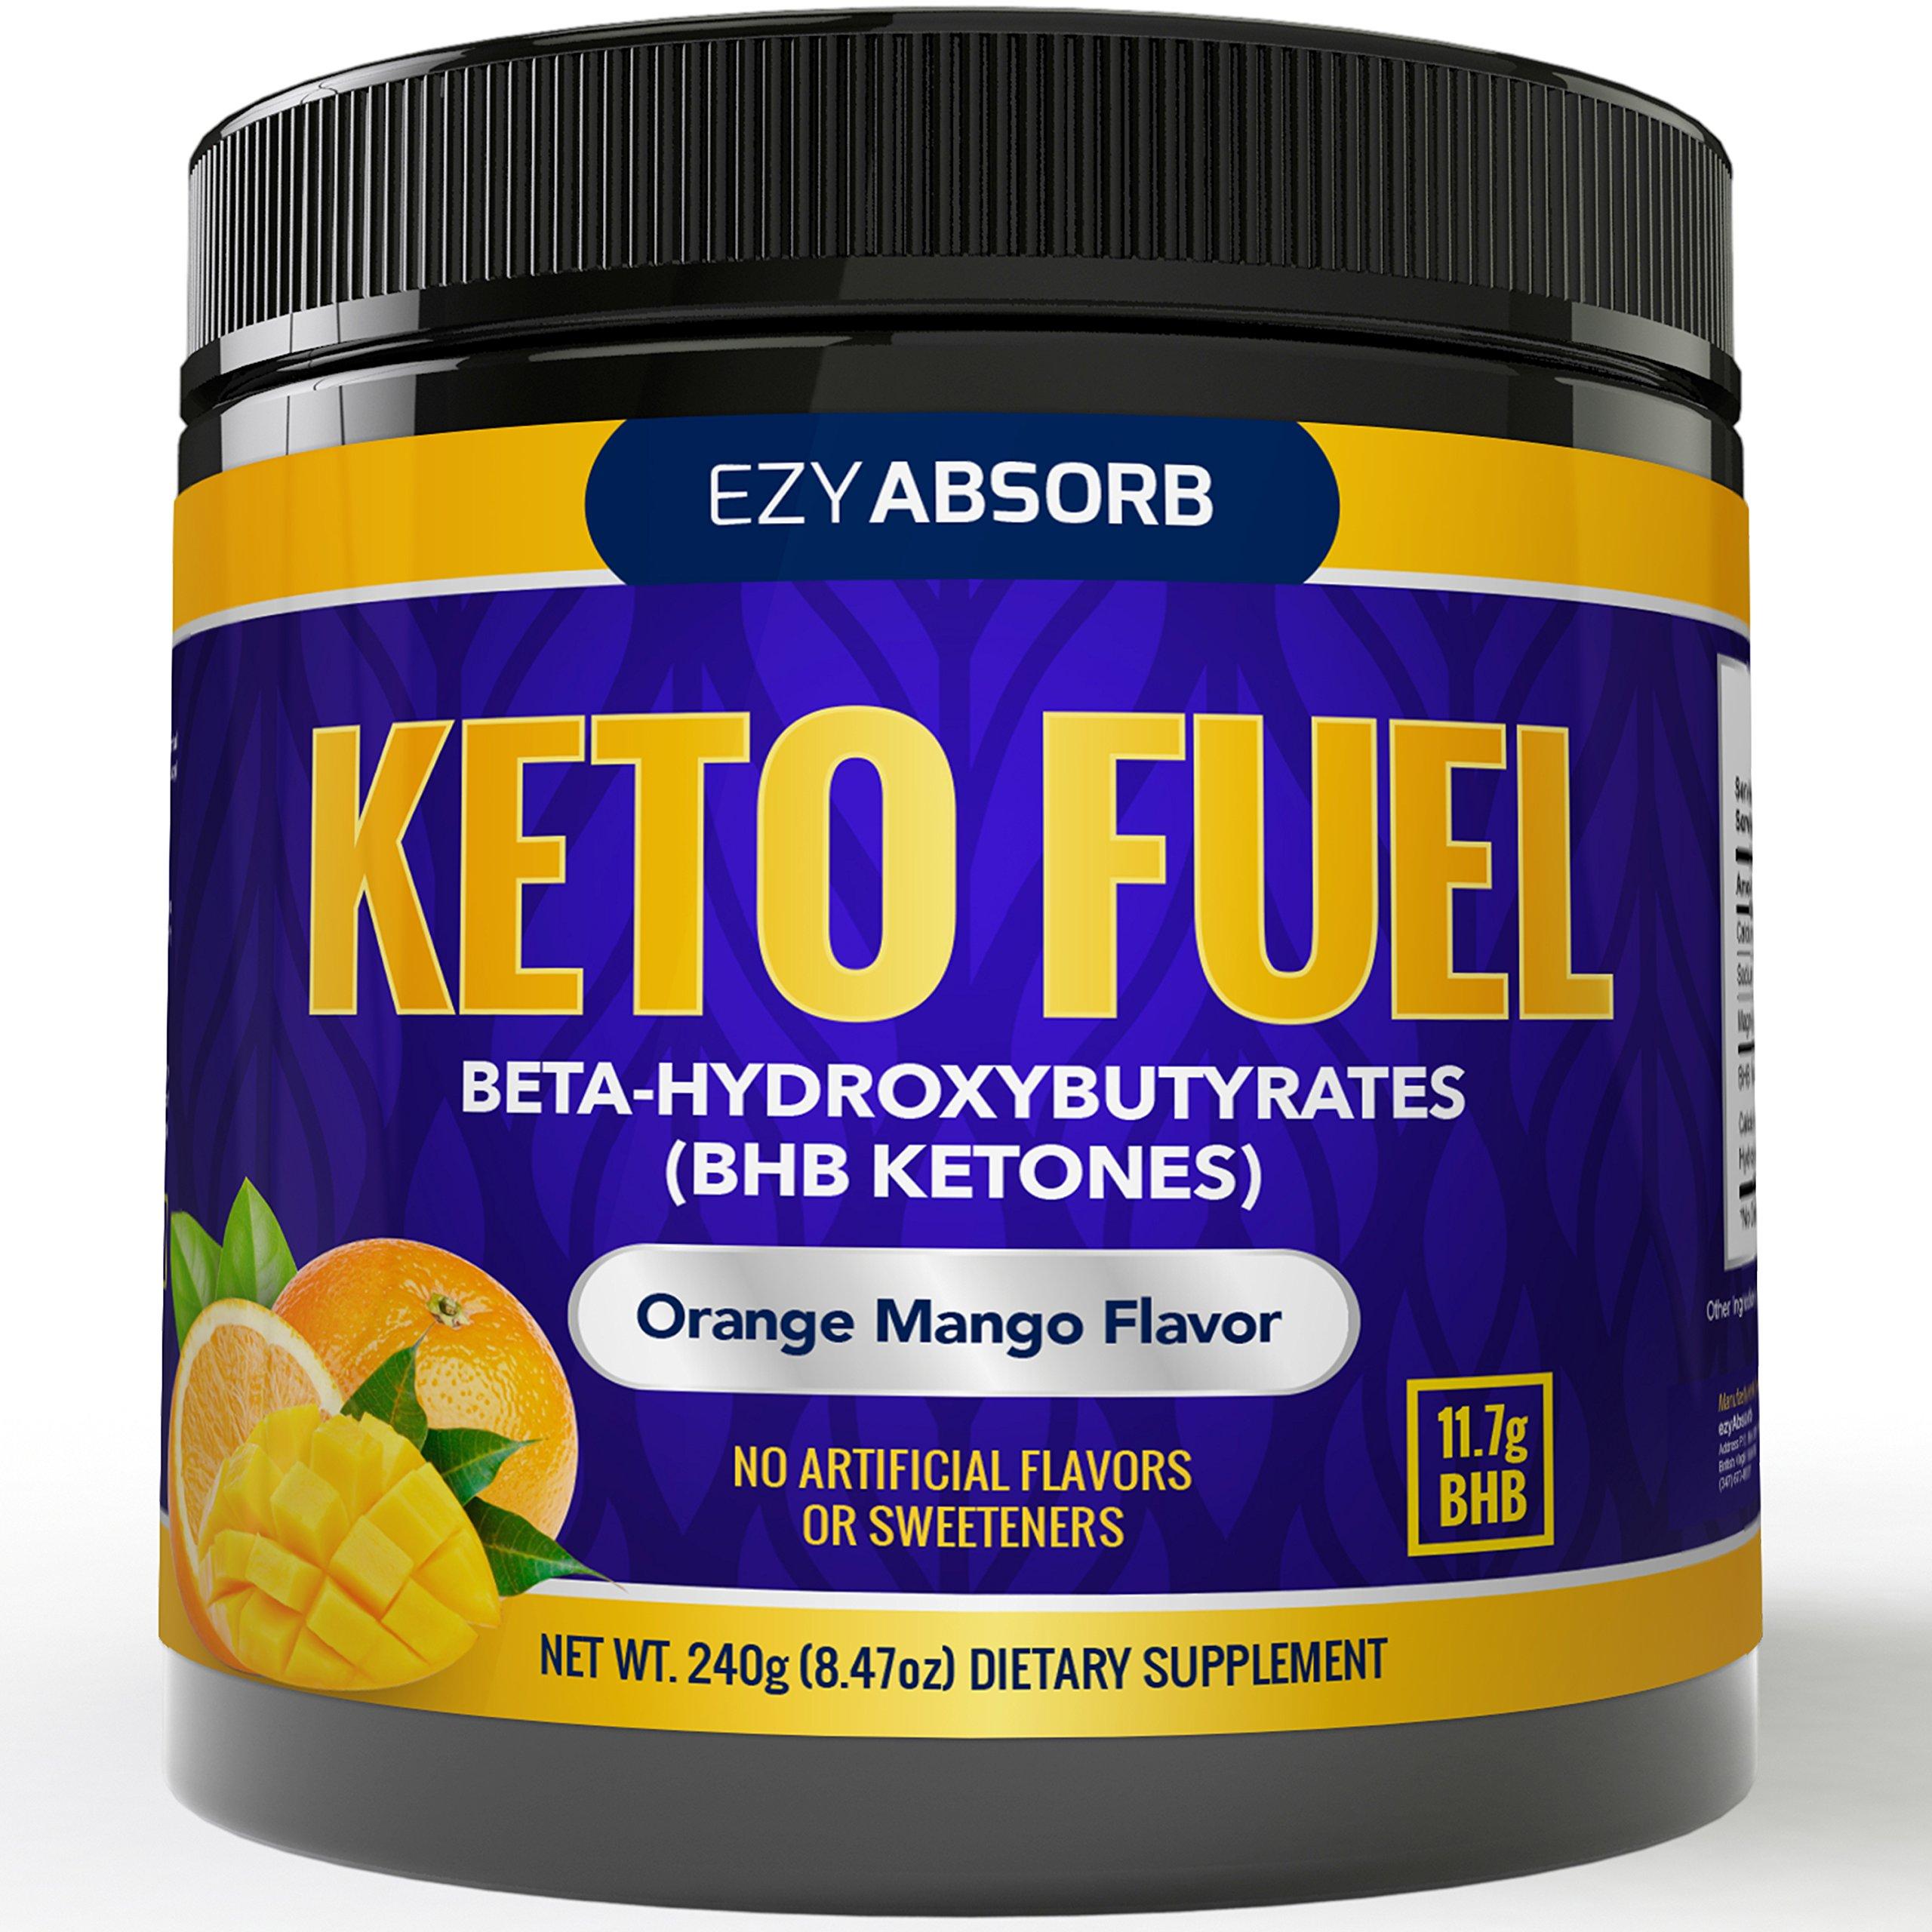 EzyAbsorb Keto BHB Ketones Salts - Exogenous Keto Complex - The Perfect Keto Snack and Keto Drink Formulated for Keto Base, Keto Diet, Keto Meal, Instant Ketones by EzyAbsorb